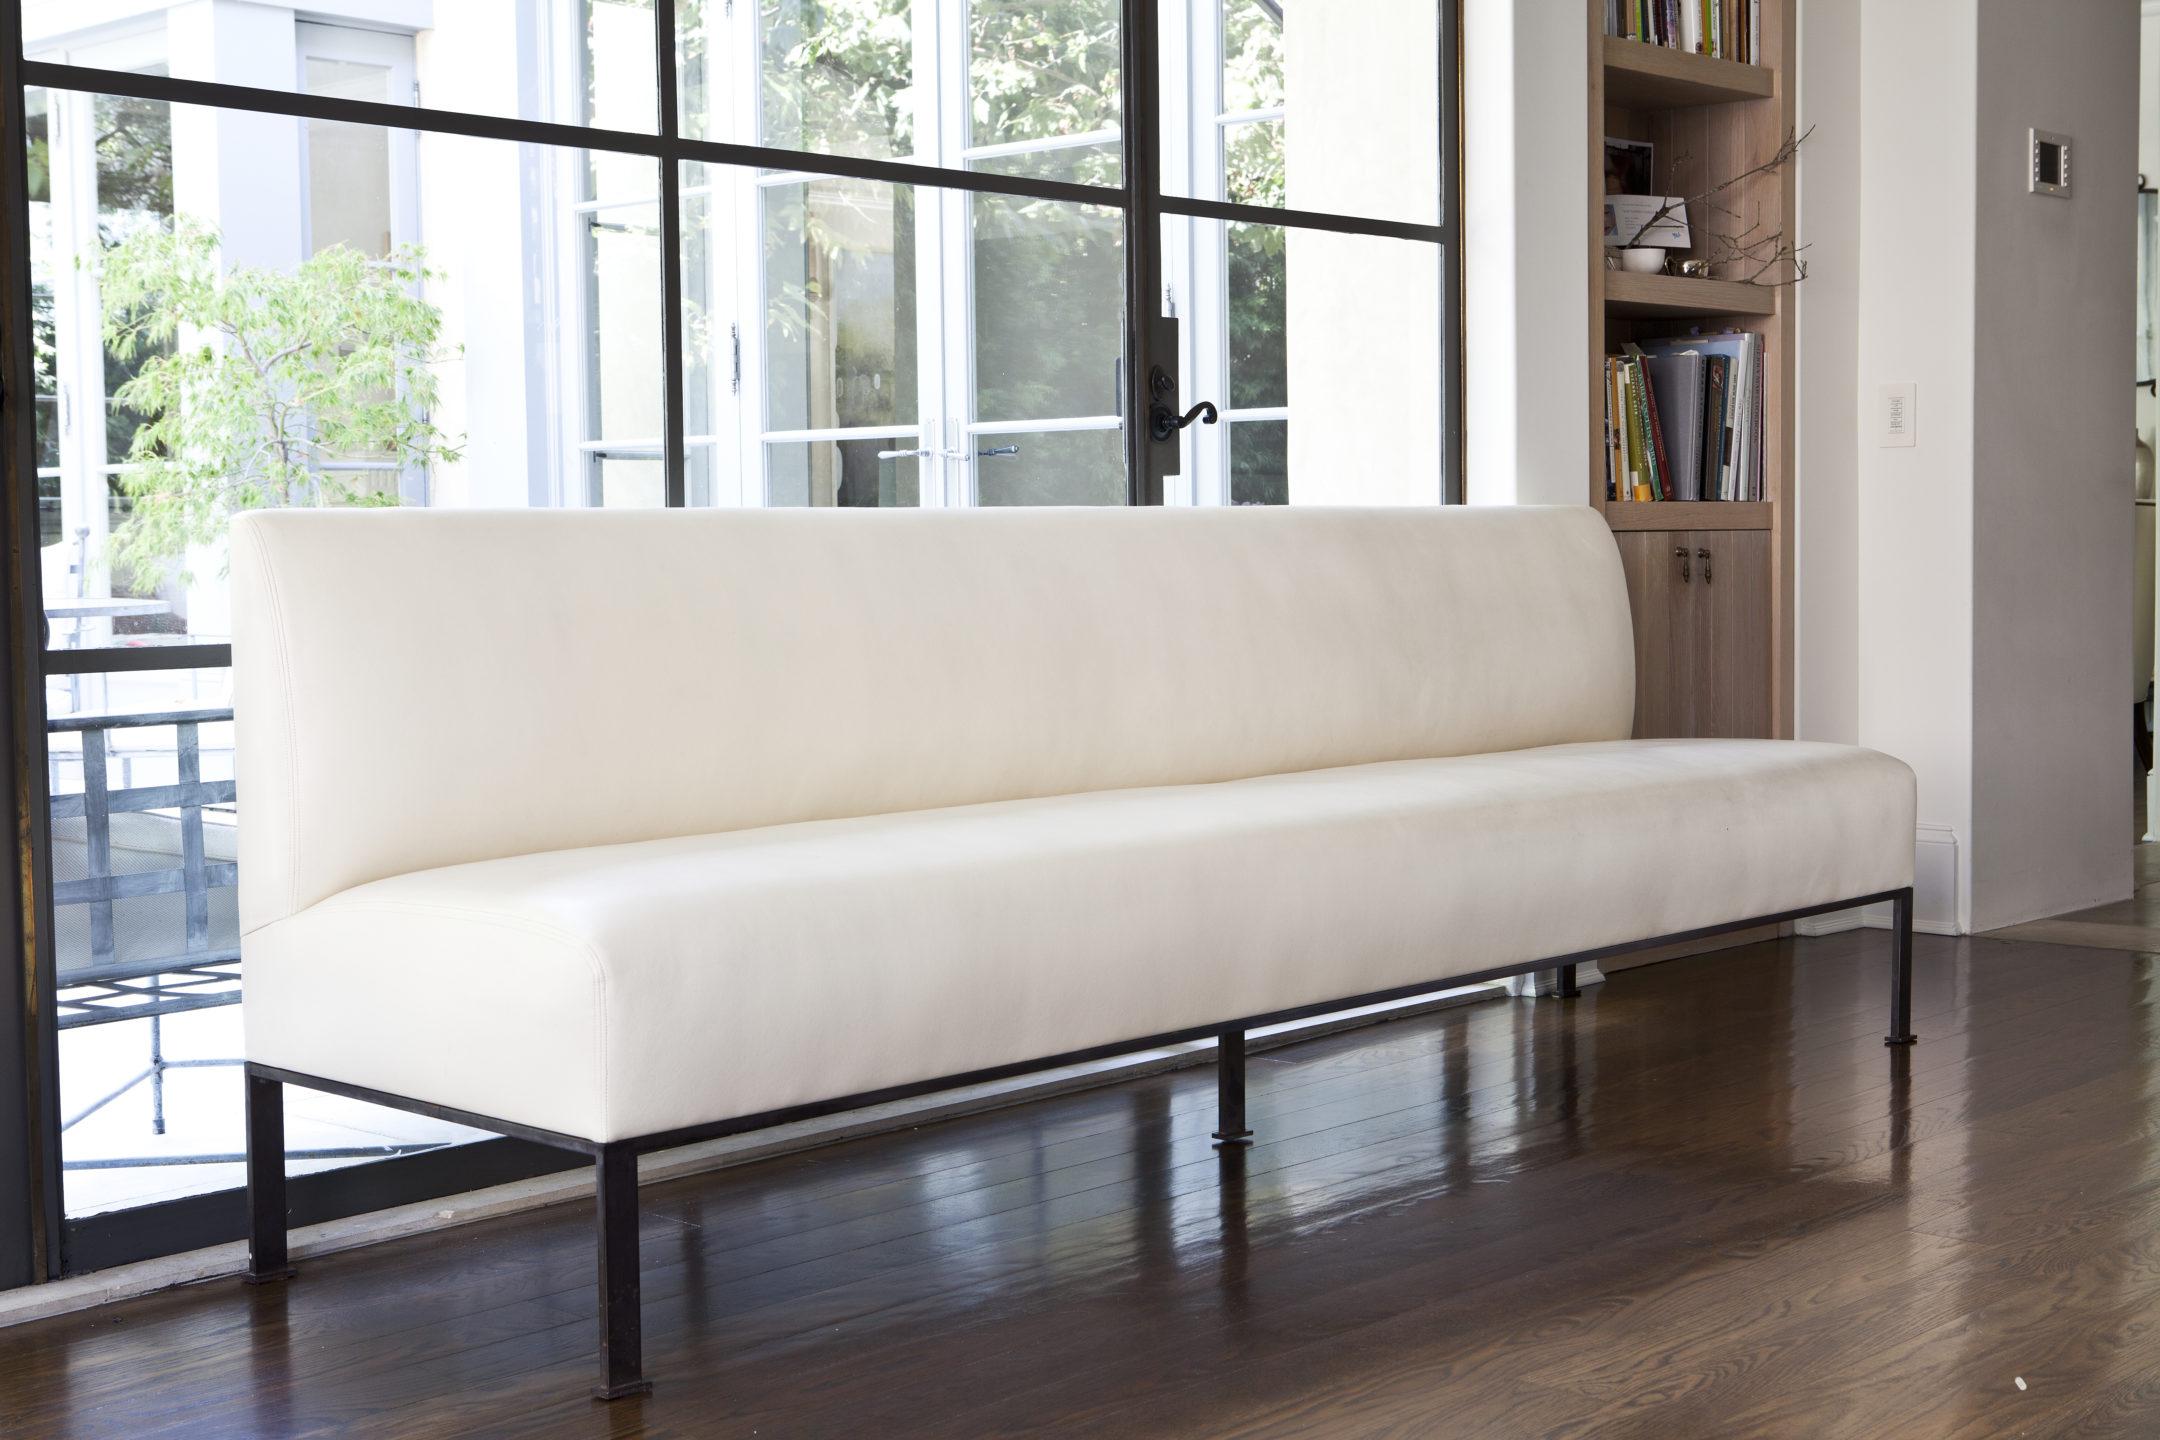 Studio_William_Hefner_products_bay_banquette_McCadden__couch